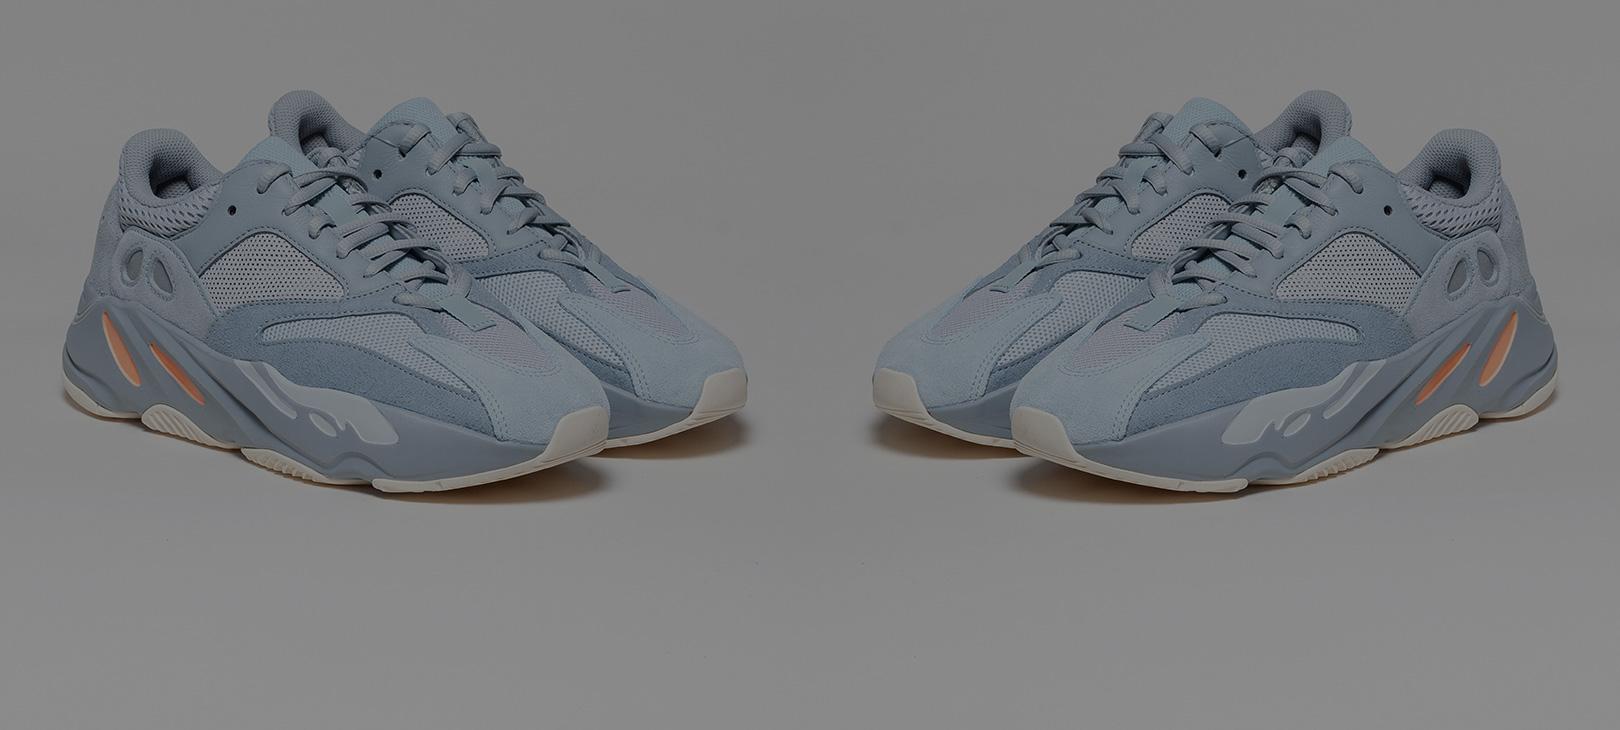 a4dc9dd8357 Nike Tech Trainer 2017 Youtube Nike Air Max 1 Dark Stucco Paint ...